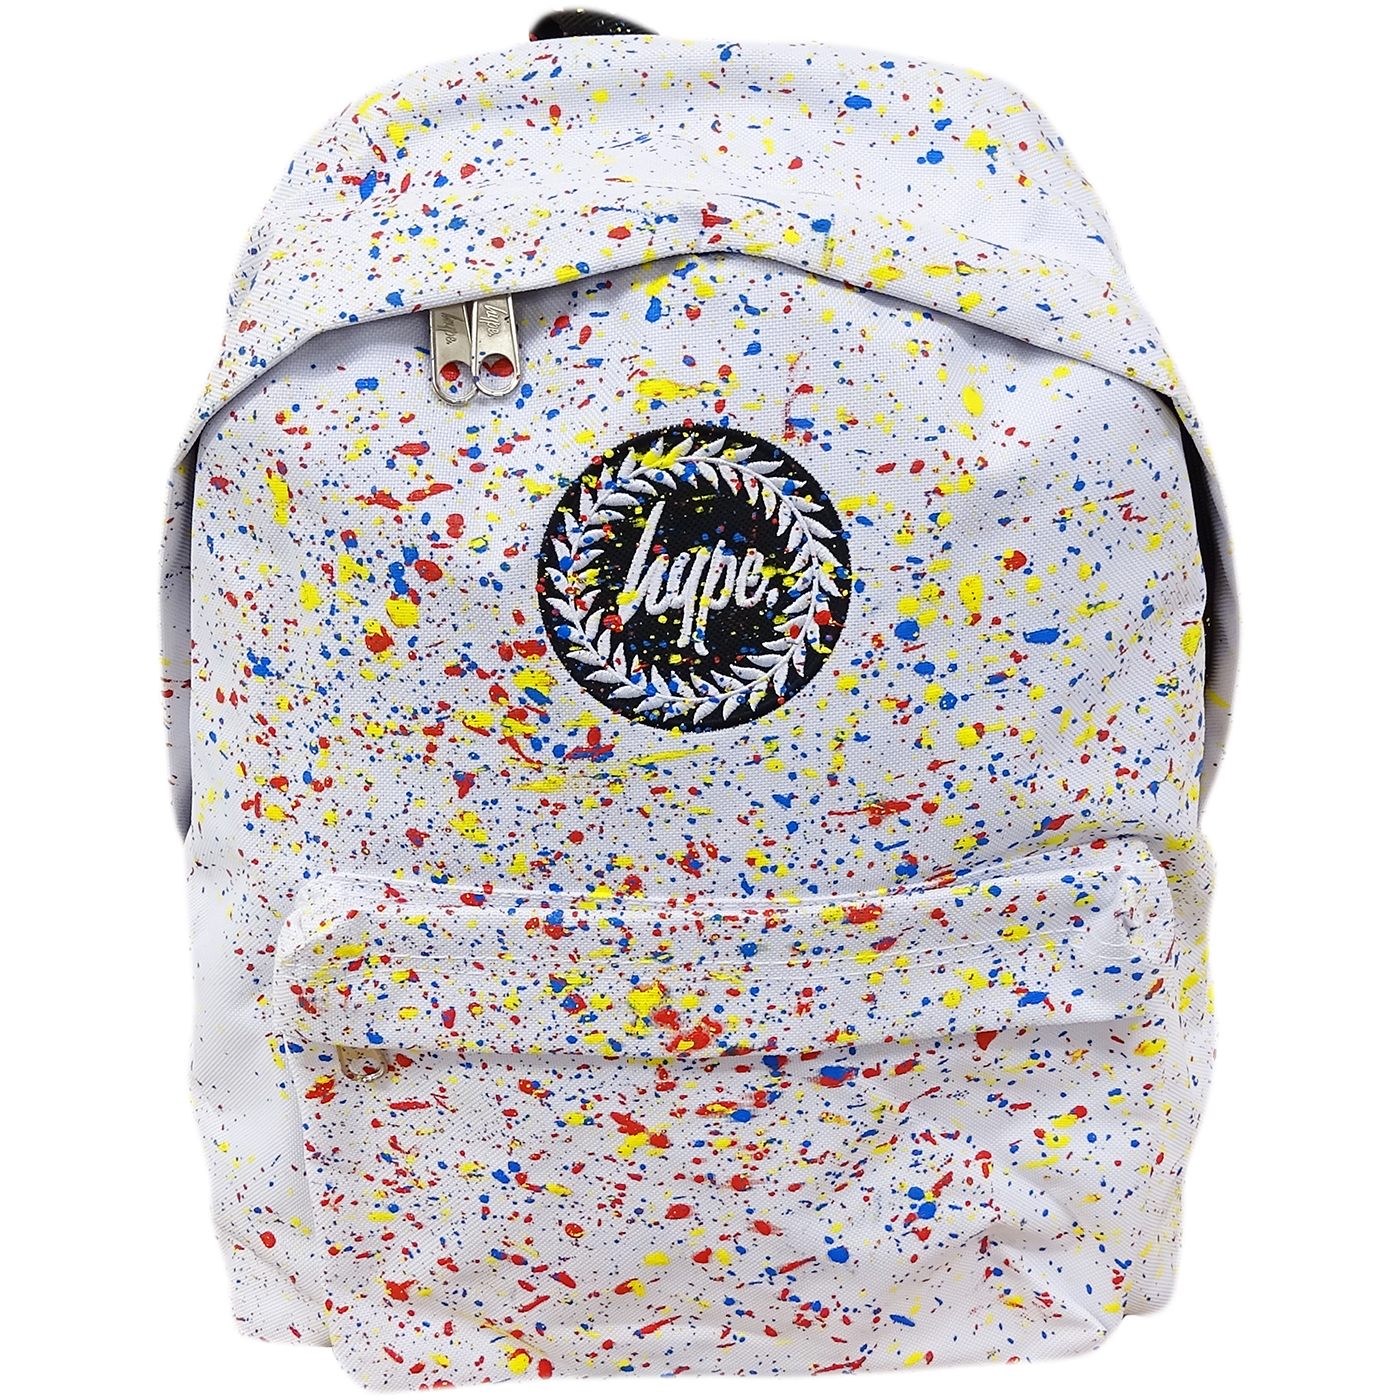 Sentinel Hype White   Multi Rucksack   School, Work, Gym Bags Bag - Splatter  Primary 3183763caf